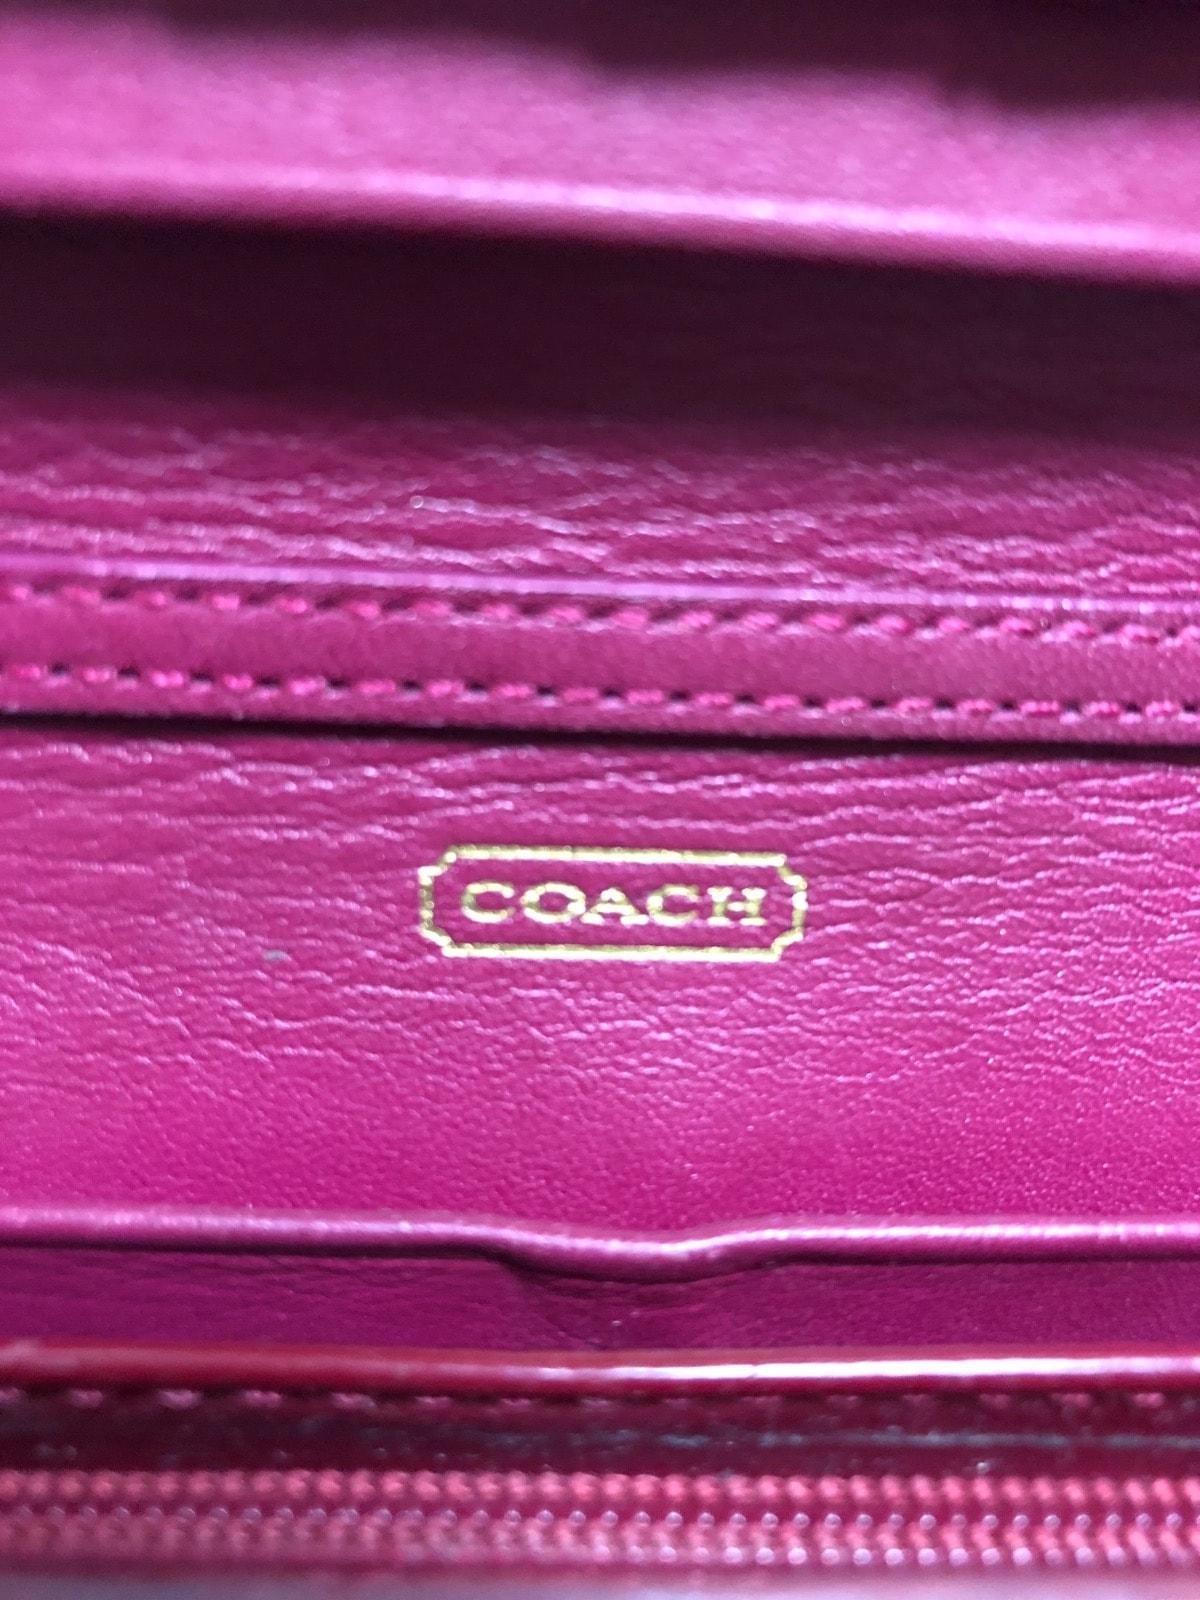 b9f938e226a8 ... COACH(コーチ) 財布 オプアート レッド リボン エナメル(レザー) 4